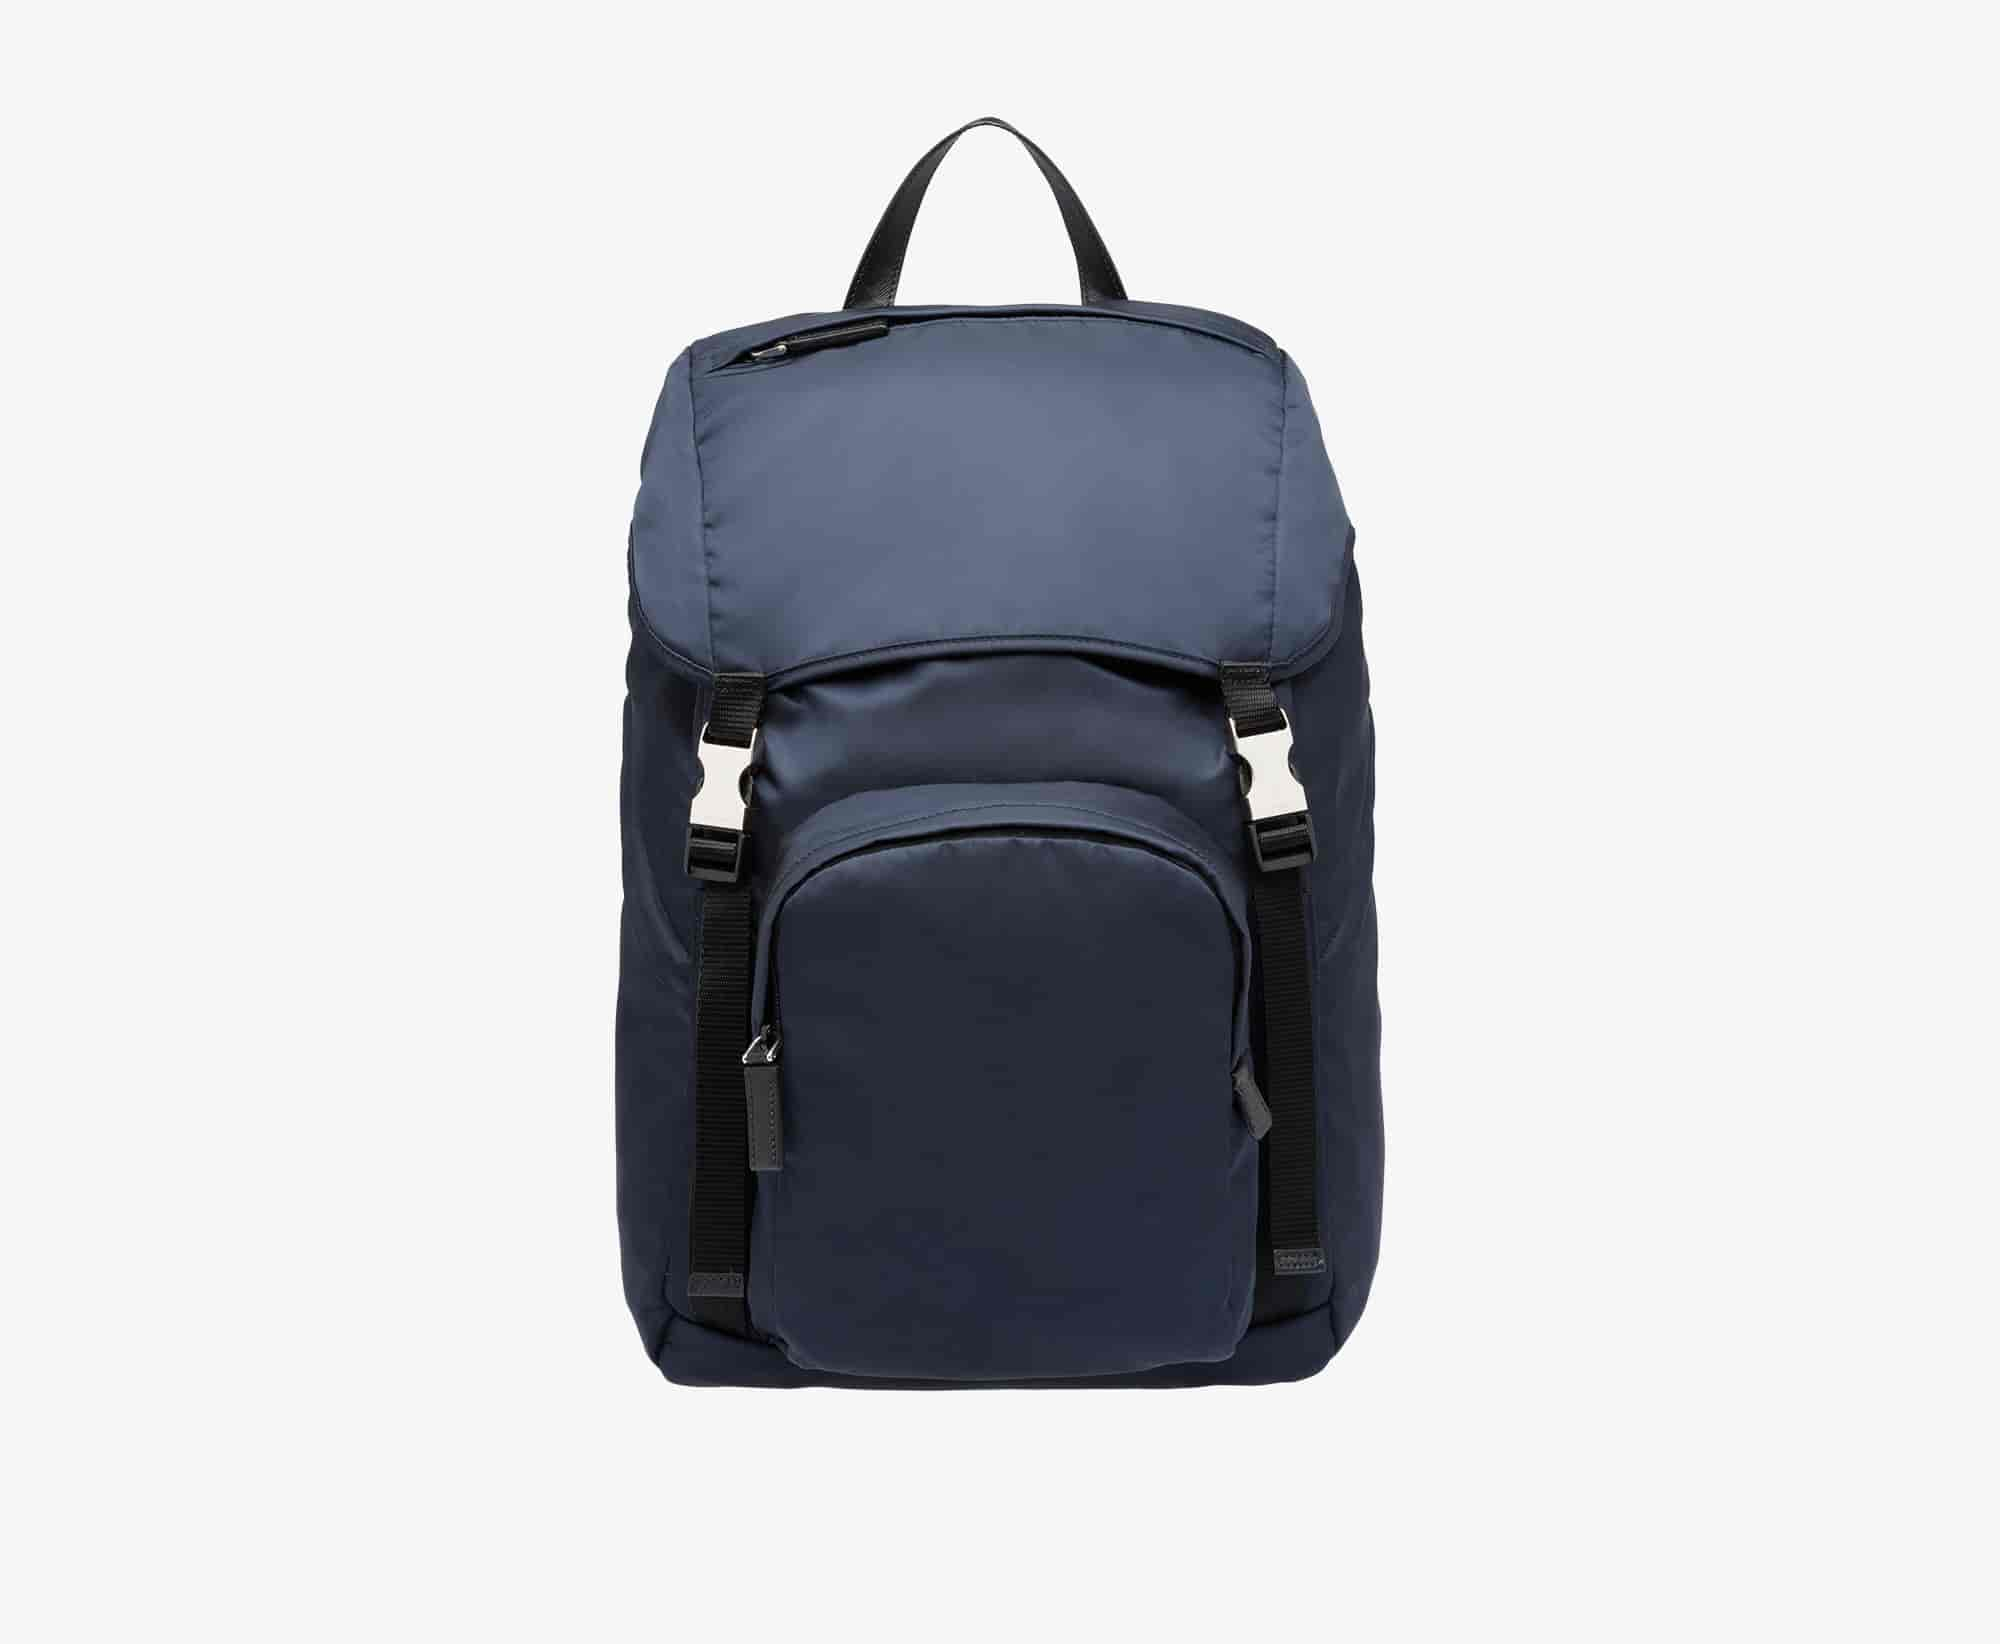 fc24e51b promo code for prada backpack 973 number 3671d 04fc4